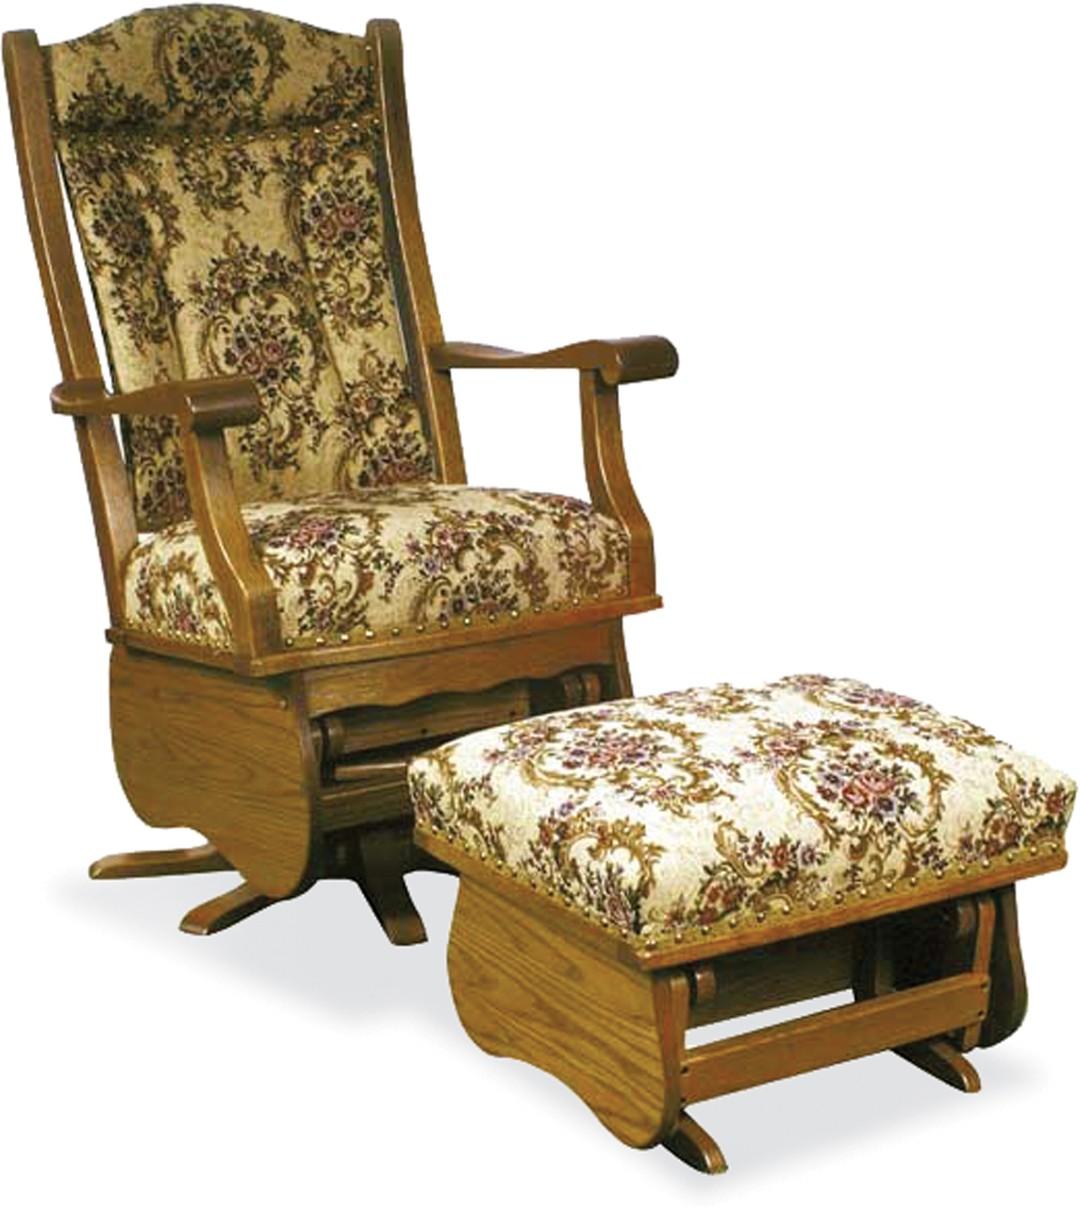 childcare glider rocking chair ottoman walnut steel price in delhi buckeye town and country furniture